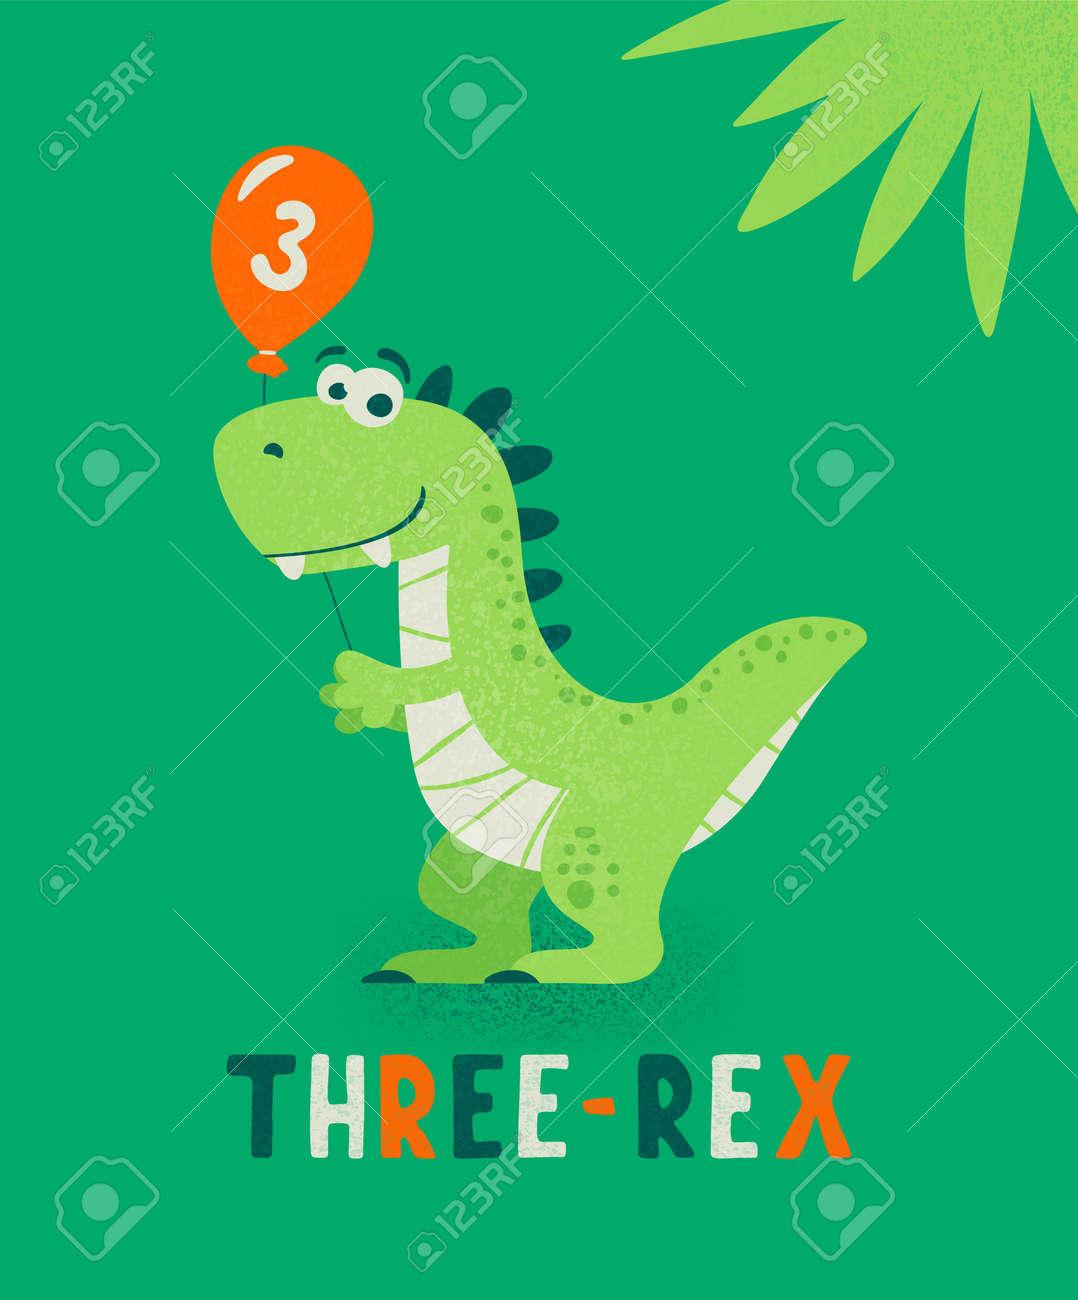 Dinosaur Tirannosaur Three Rex. Cartoon Tirex. Happy Birthday Card for a Child for Three Years. Vector Cute and Funny Cartoon Hand Drawn Dinosaur Holding Balloon. Kids, Children s Illustration, Print - 172654339